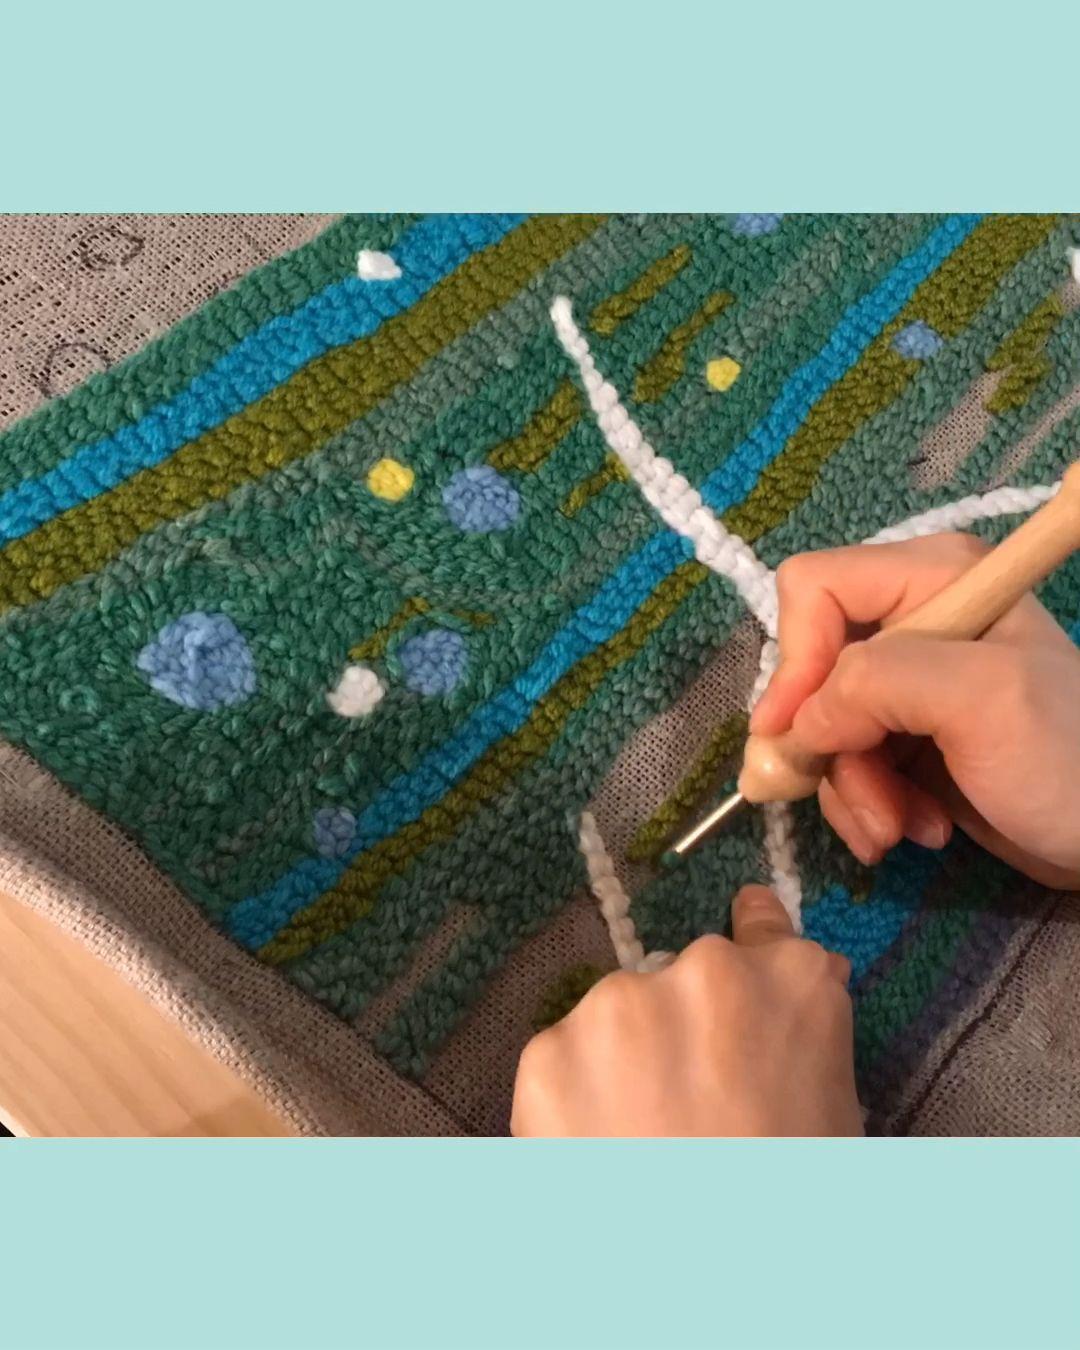 Work in Progress speedy video 🍃☁️💚 . . .  #timelapse #timelapseart #makersgonnamake #punchneedle #punchneedleembroidery #punchneedleart #punchneedlegang #punchneedlelove #rughooking #makermakes #littlecanvas #punchneedlerughooking #punchneedling #punchneedleartist #handmade #handmadecrafts #makingstuff #wip #workinprogress #studiolife #artstudio #craftstudio #yarnart #fibreart #windturbine #windturbineart #makersofinstagram #punchneedleaddict #havingfun😄